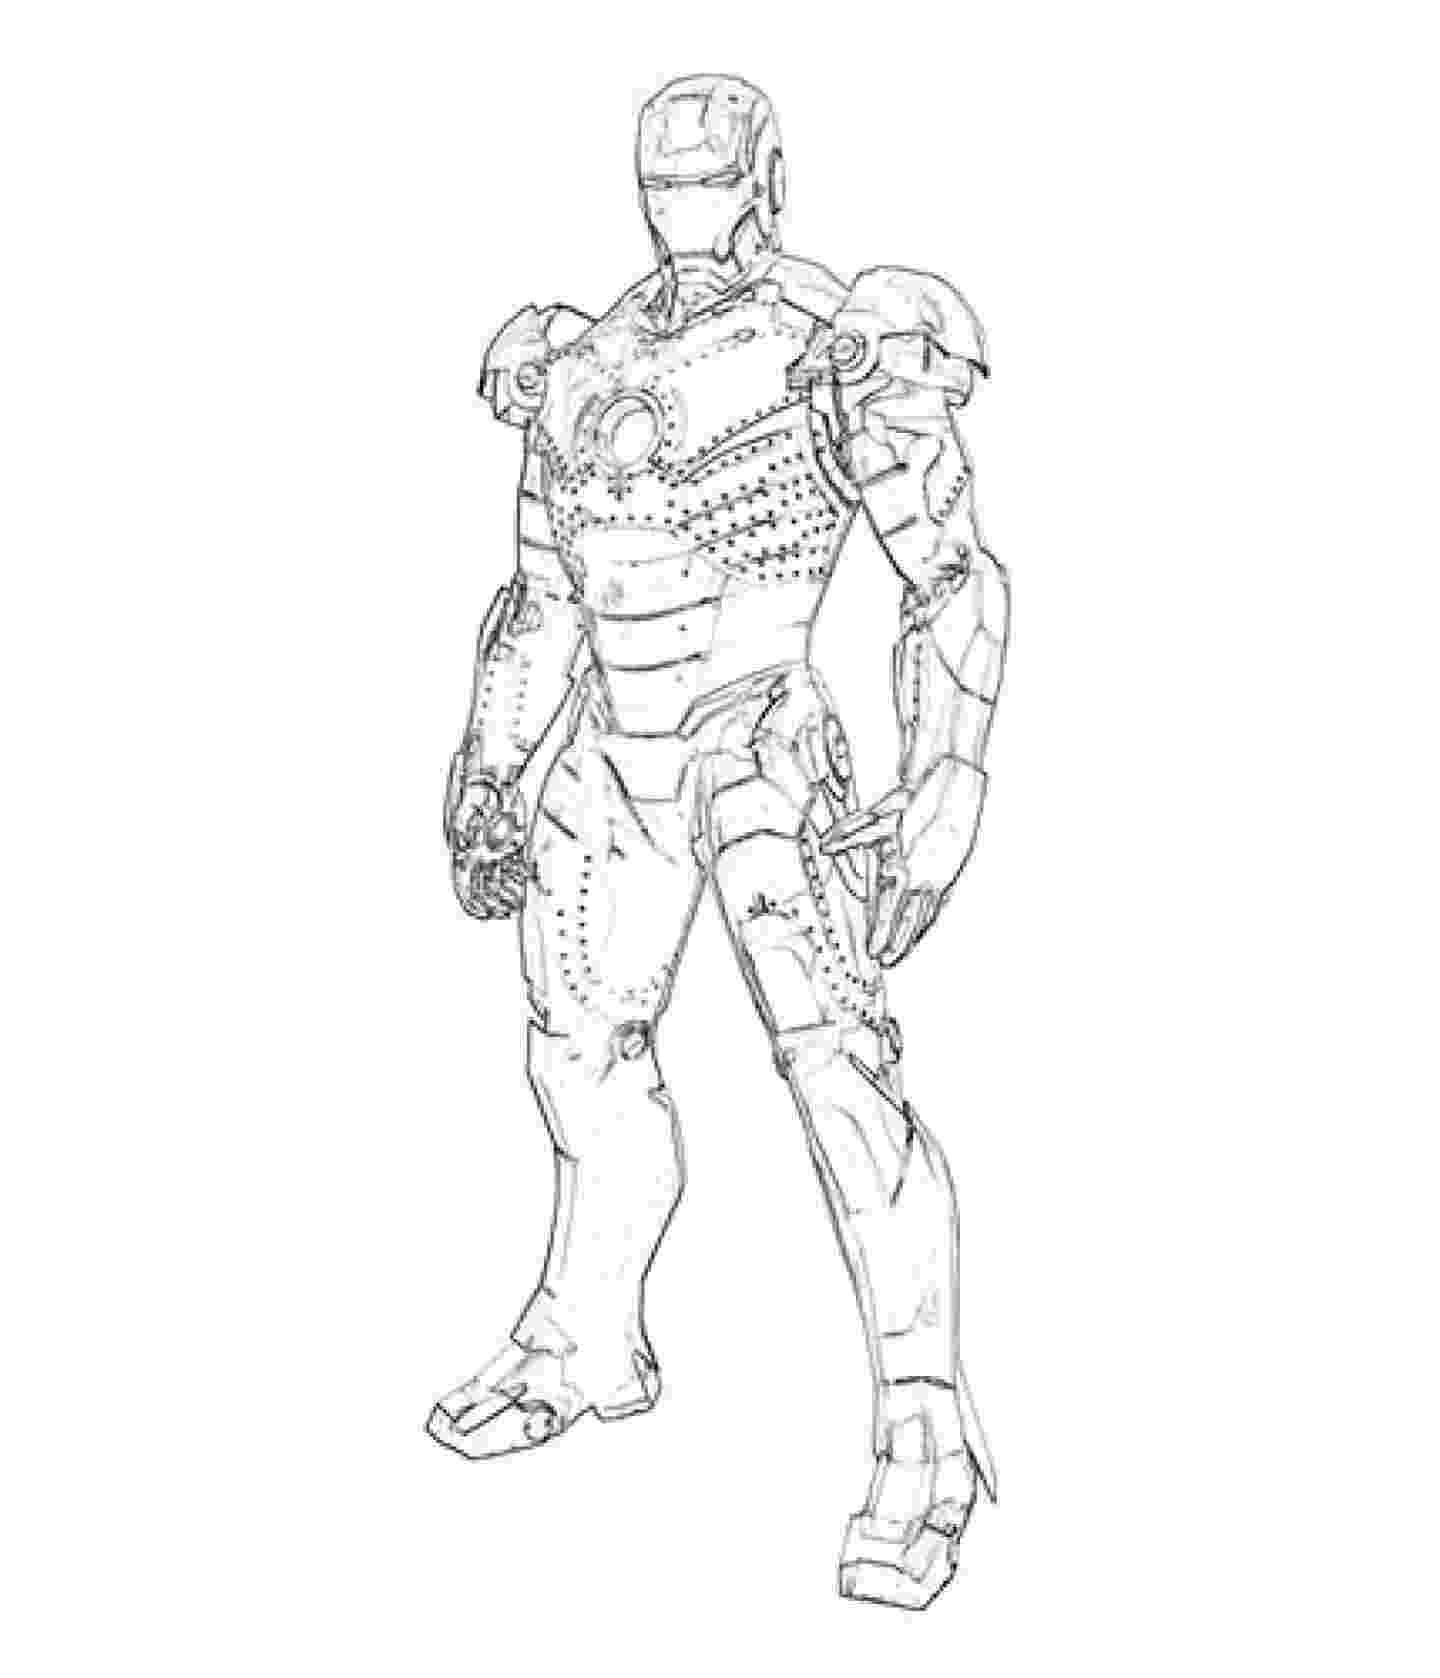 iron man printable free printable iron man coloring pages for kids best iron printable man